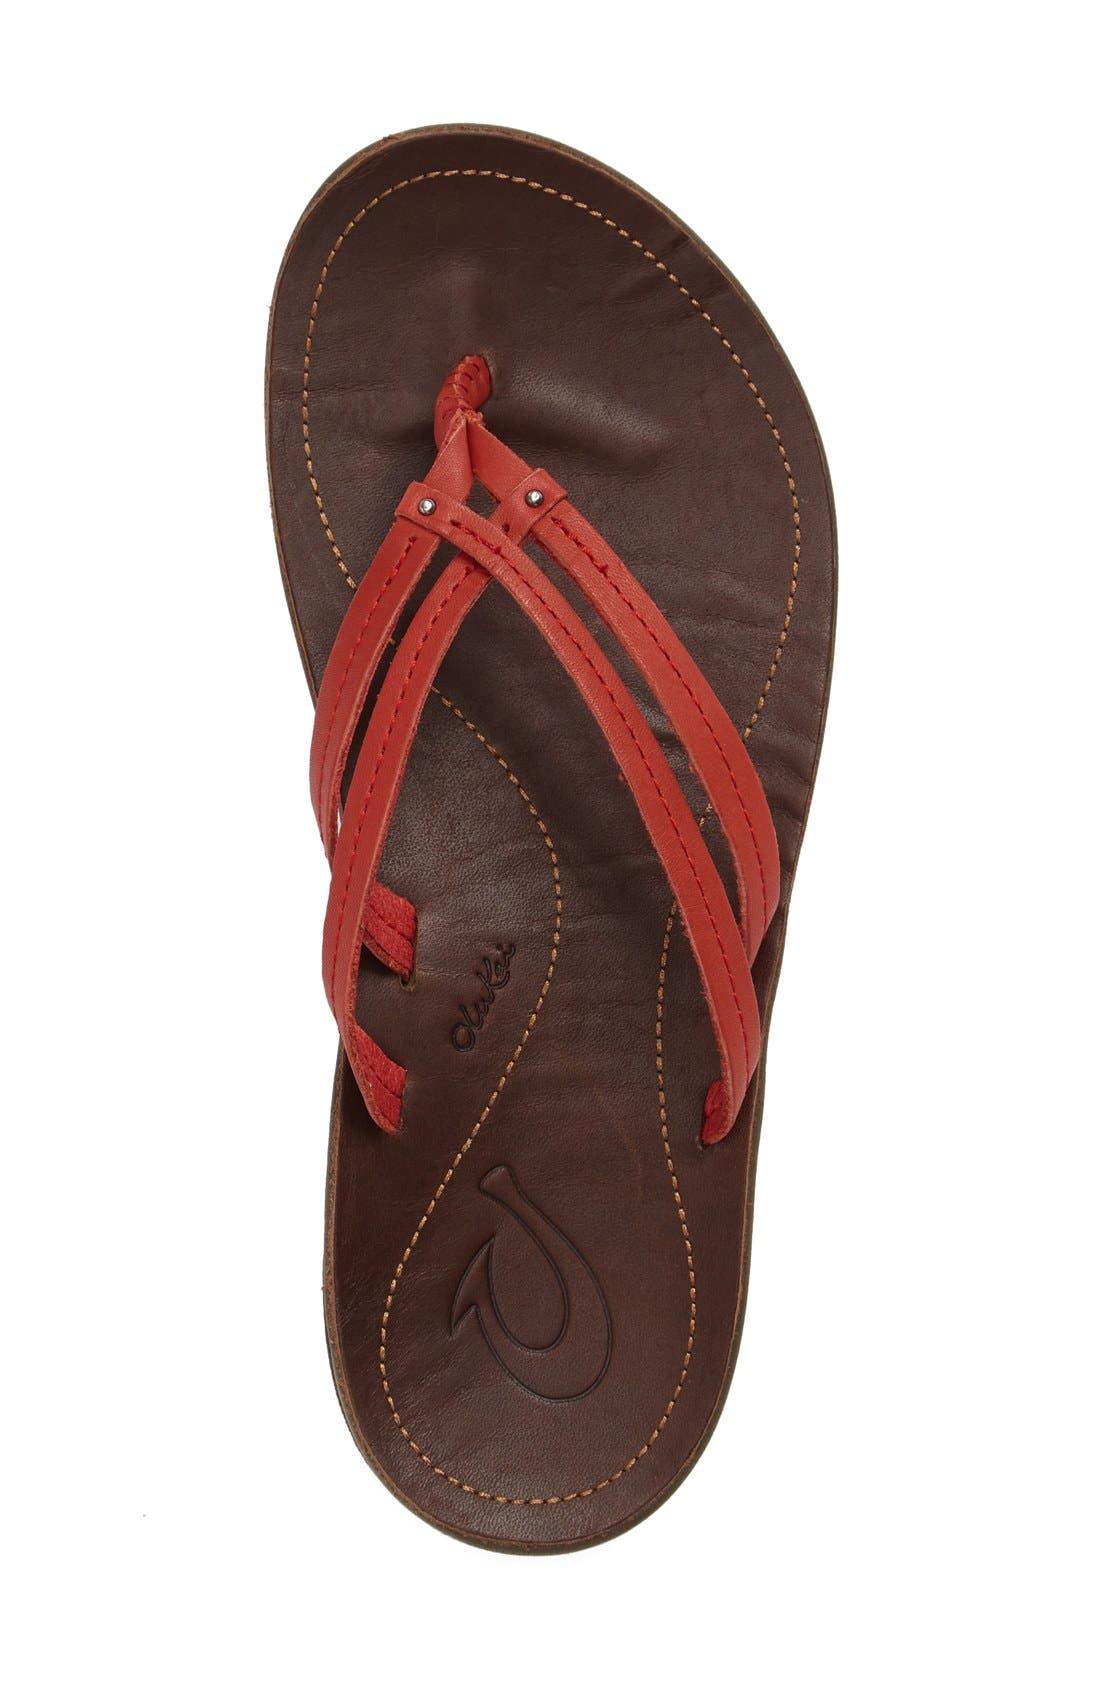 Alternate Image 3  - OluKai 'U'i' Thong Sandal (Women)